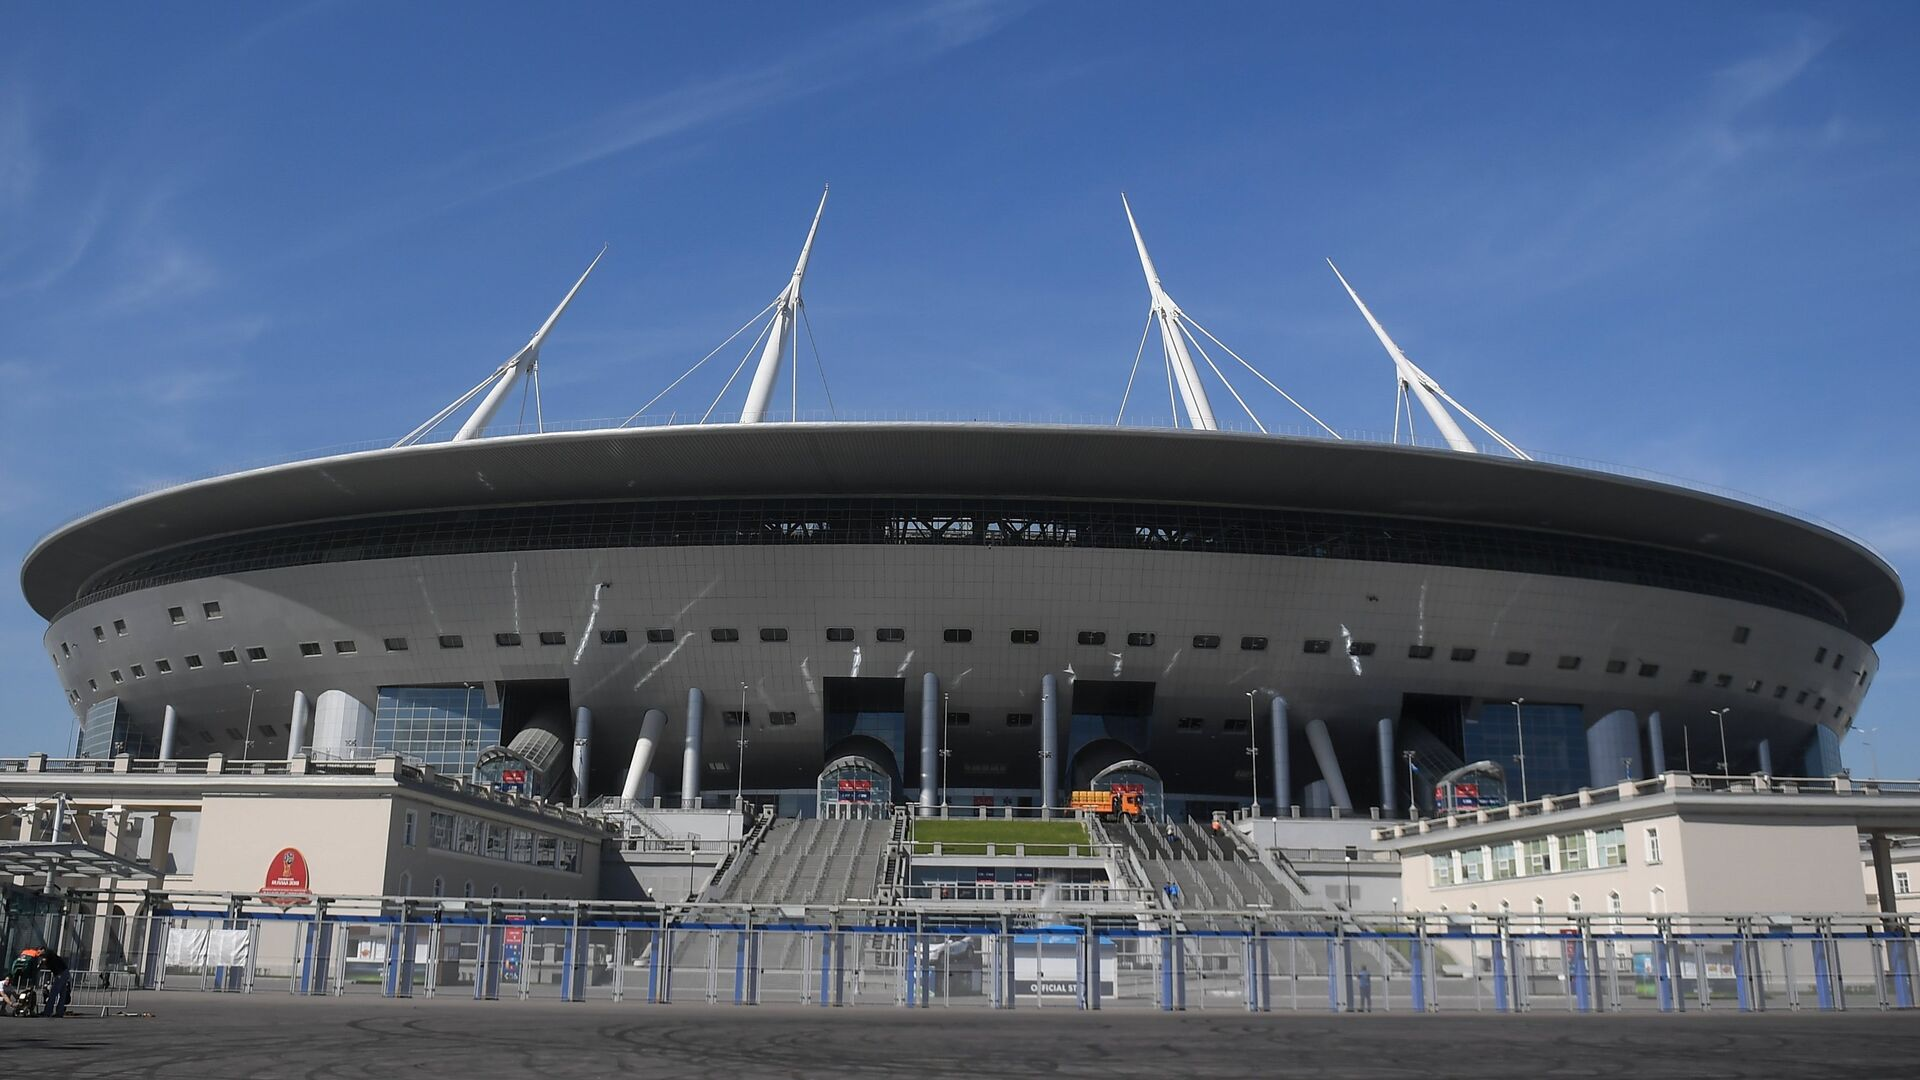 Стадион Санкт-Петербург, где пройдут матчи чемпионата мира по футболу 2018 - РИА Новости, 1920, 01.06.2021